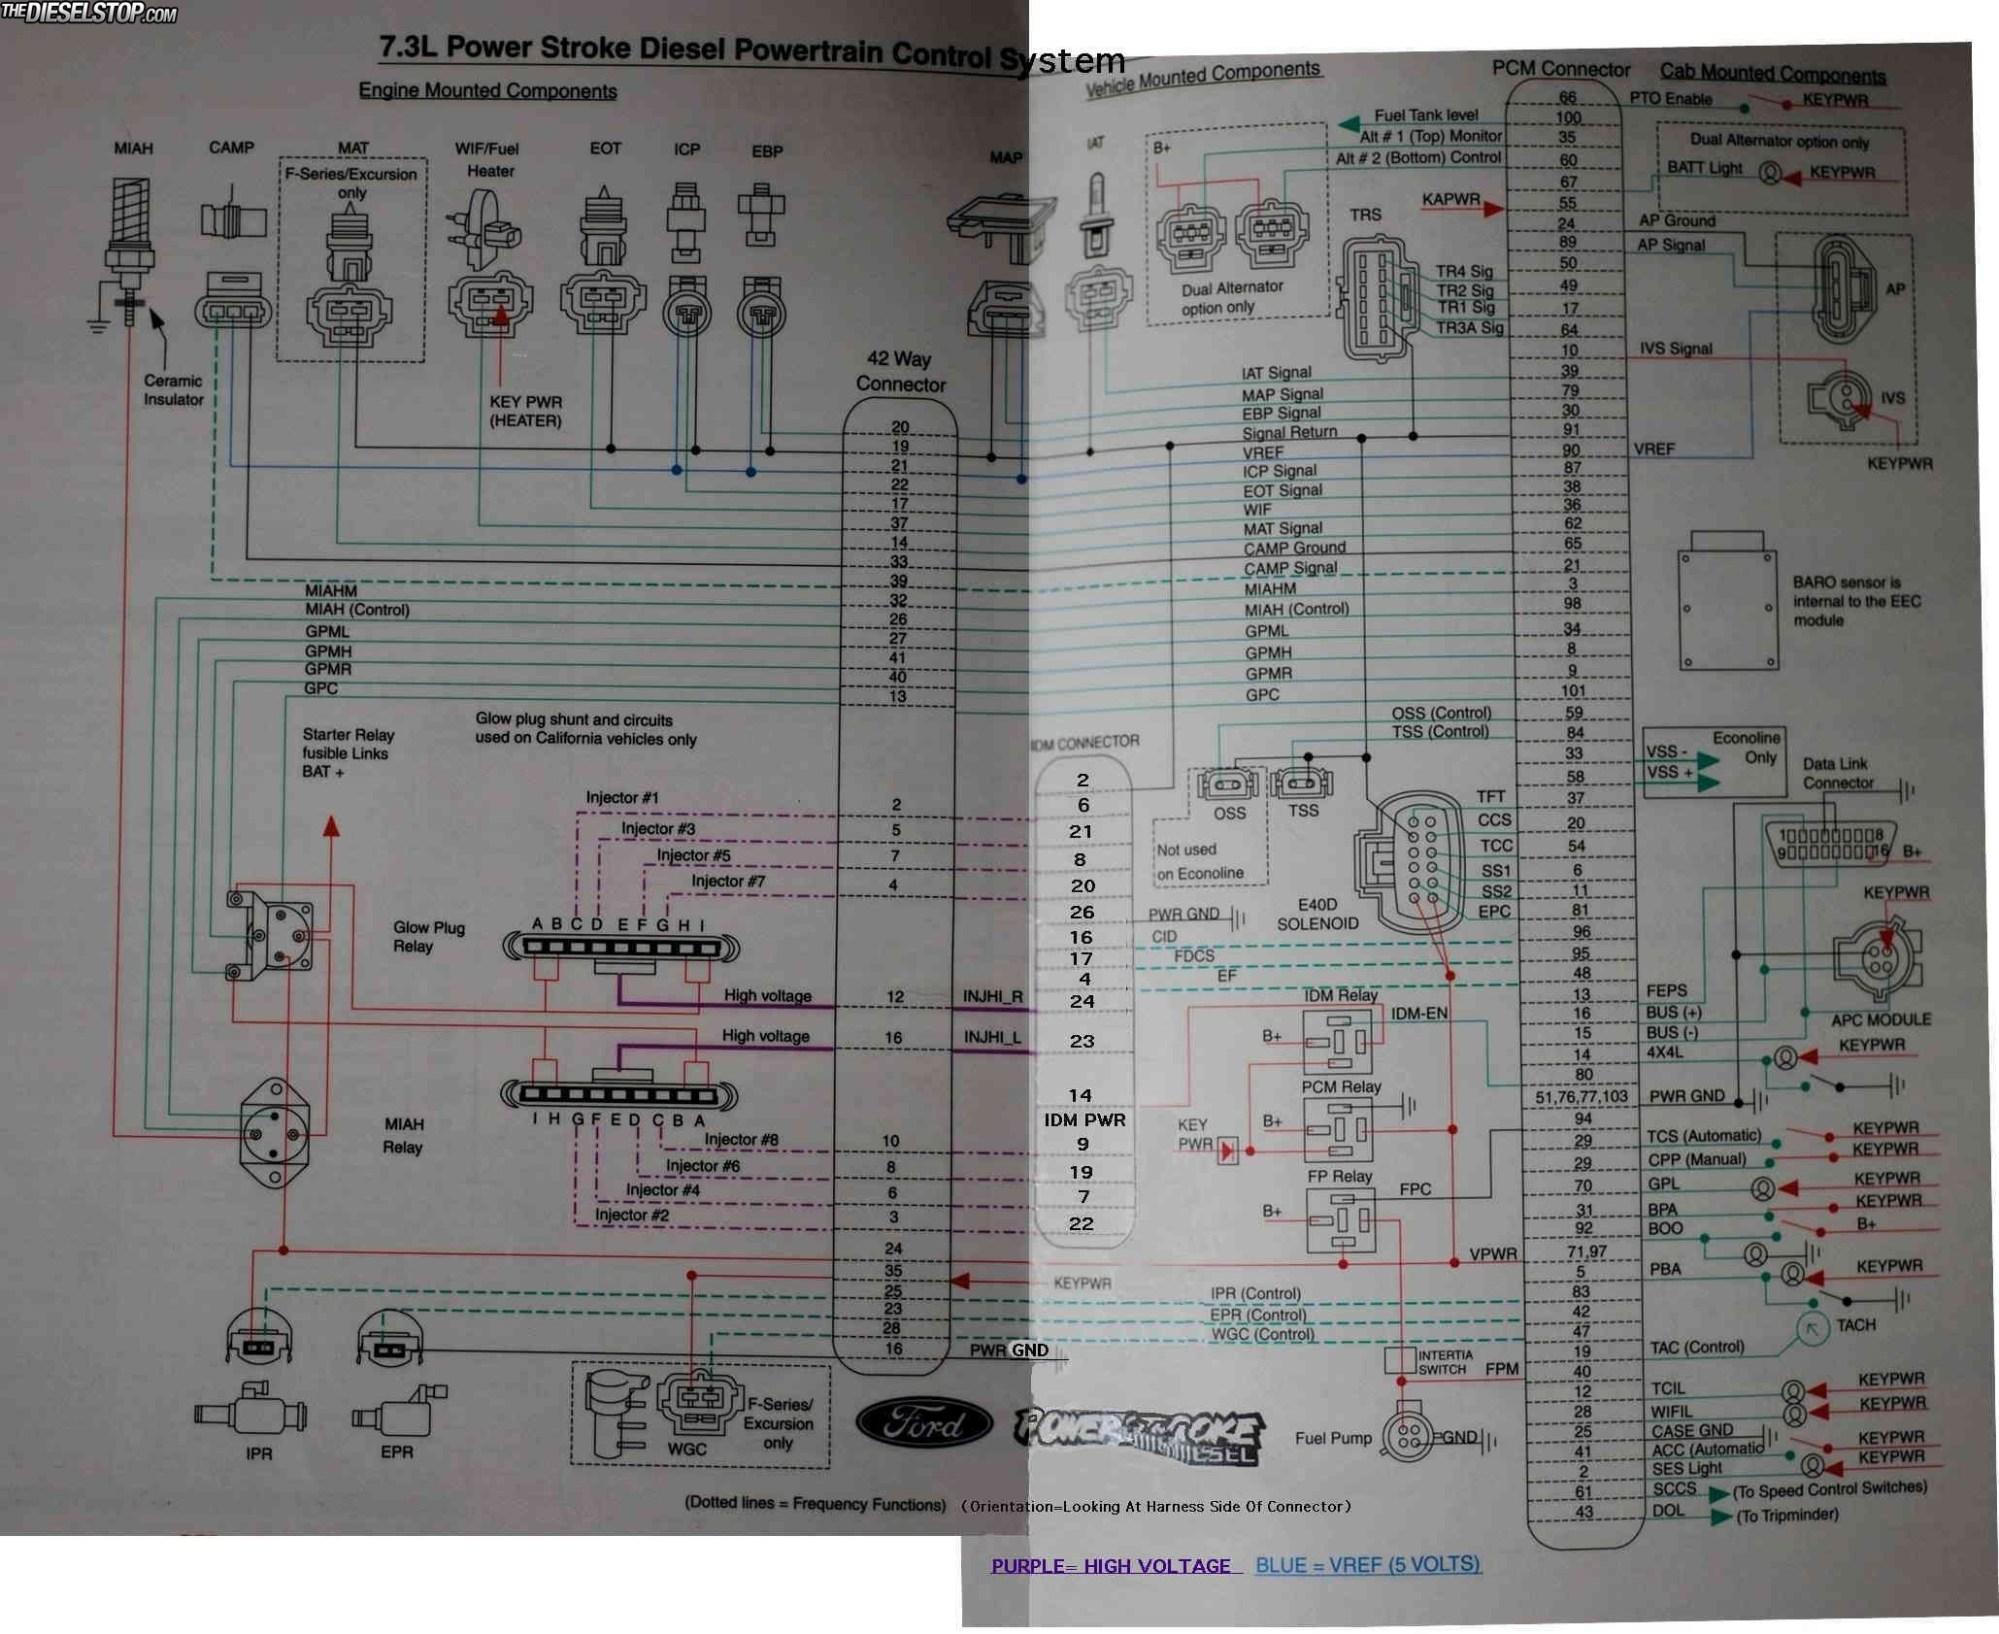 hight resolution of 1995 7 3 powerstroke wiring schematic easy wiring diagrams u2022 rh 167 99 236 249 7 3